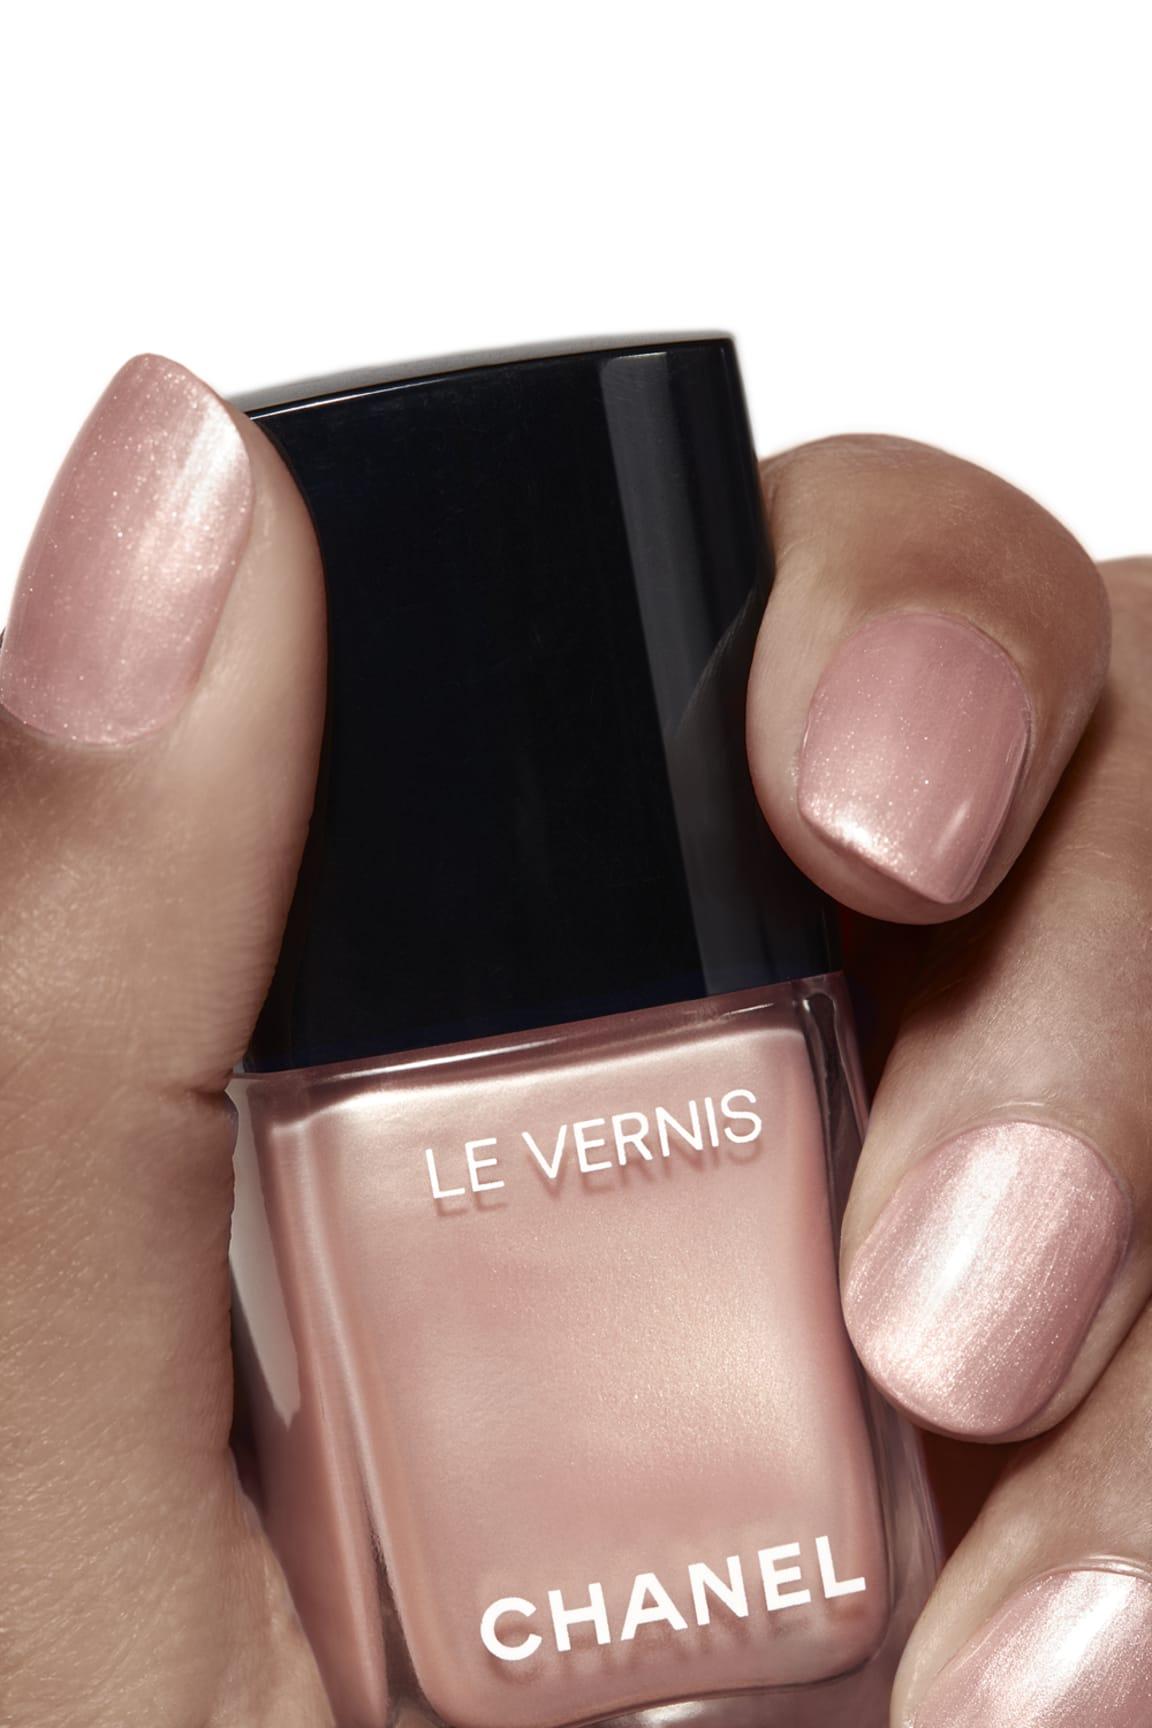 Application makeup visual 1 - LE VERNIS 895 - SUNLIGHT